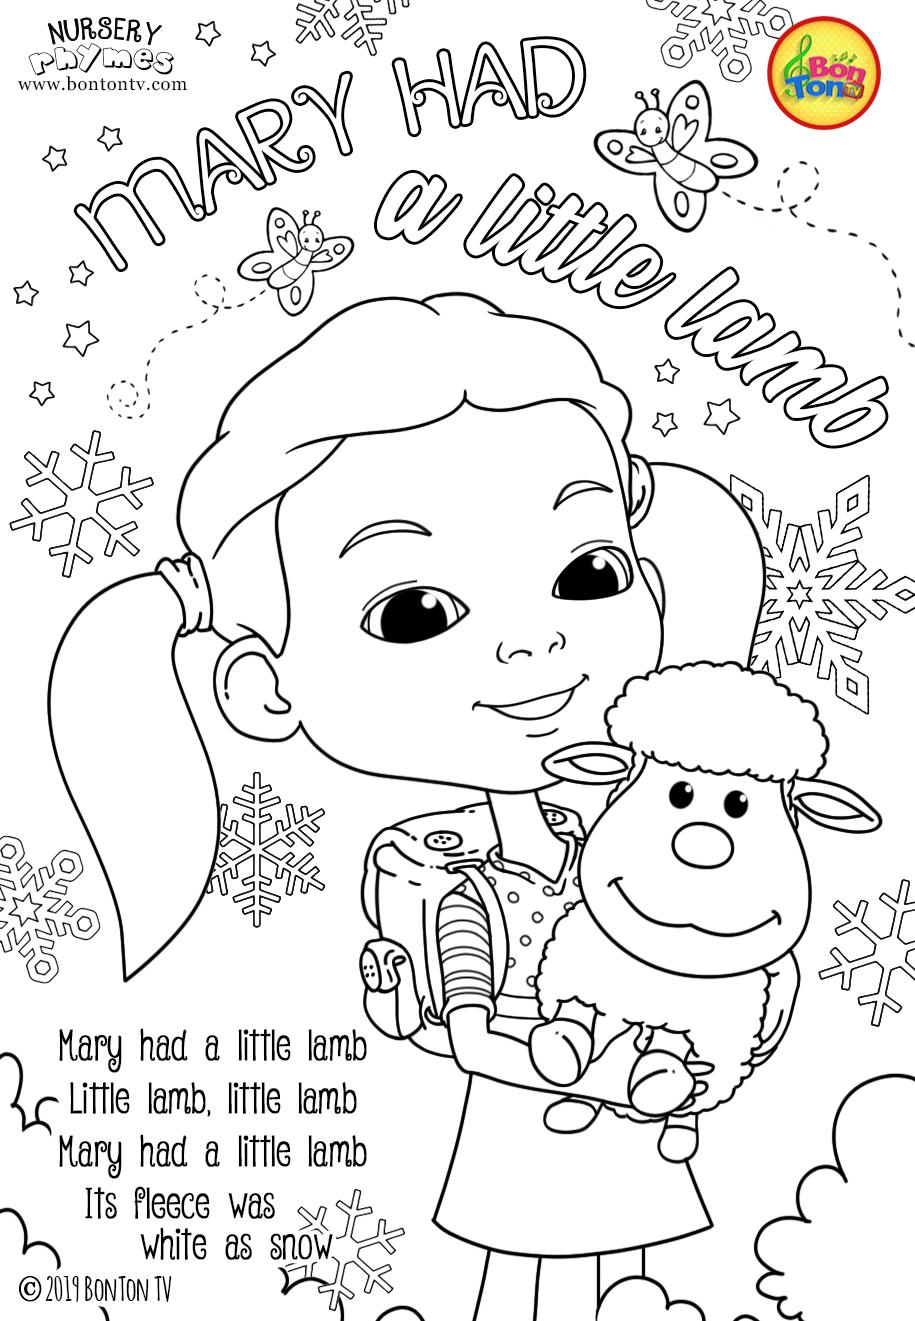 Nursery Rhymes Coloring Pages Free Preschool Printables For Kids Twinkle Twinkle Little Star Mary Had A Little Lamb Jack And Ji Aulas Educacao Pinturas [ 1321 x 915 Pixel ]